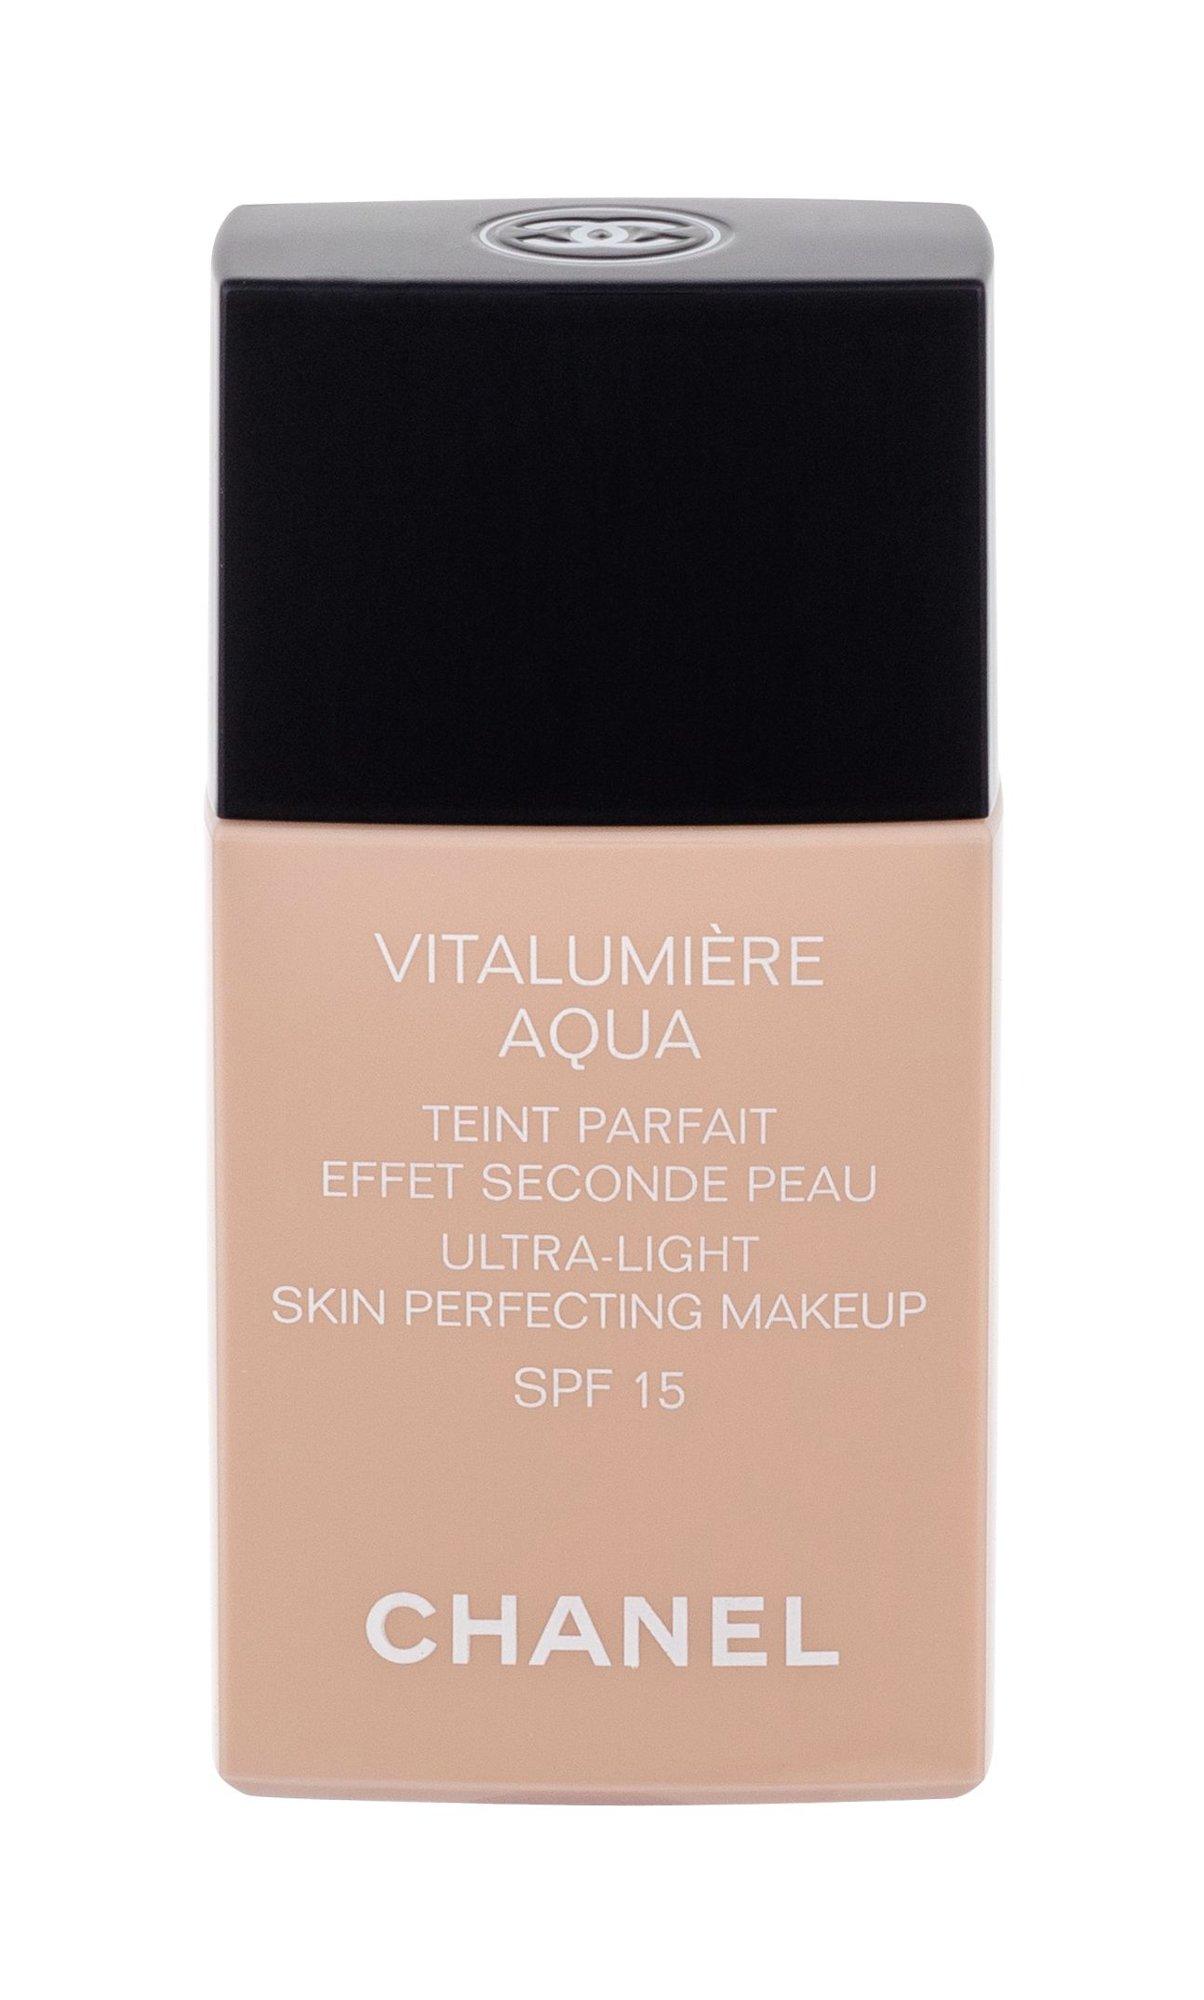 Chanel Vitalumiere Aqua Makeup 30ml 70 Beige SPF15